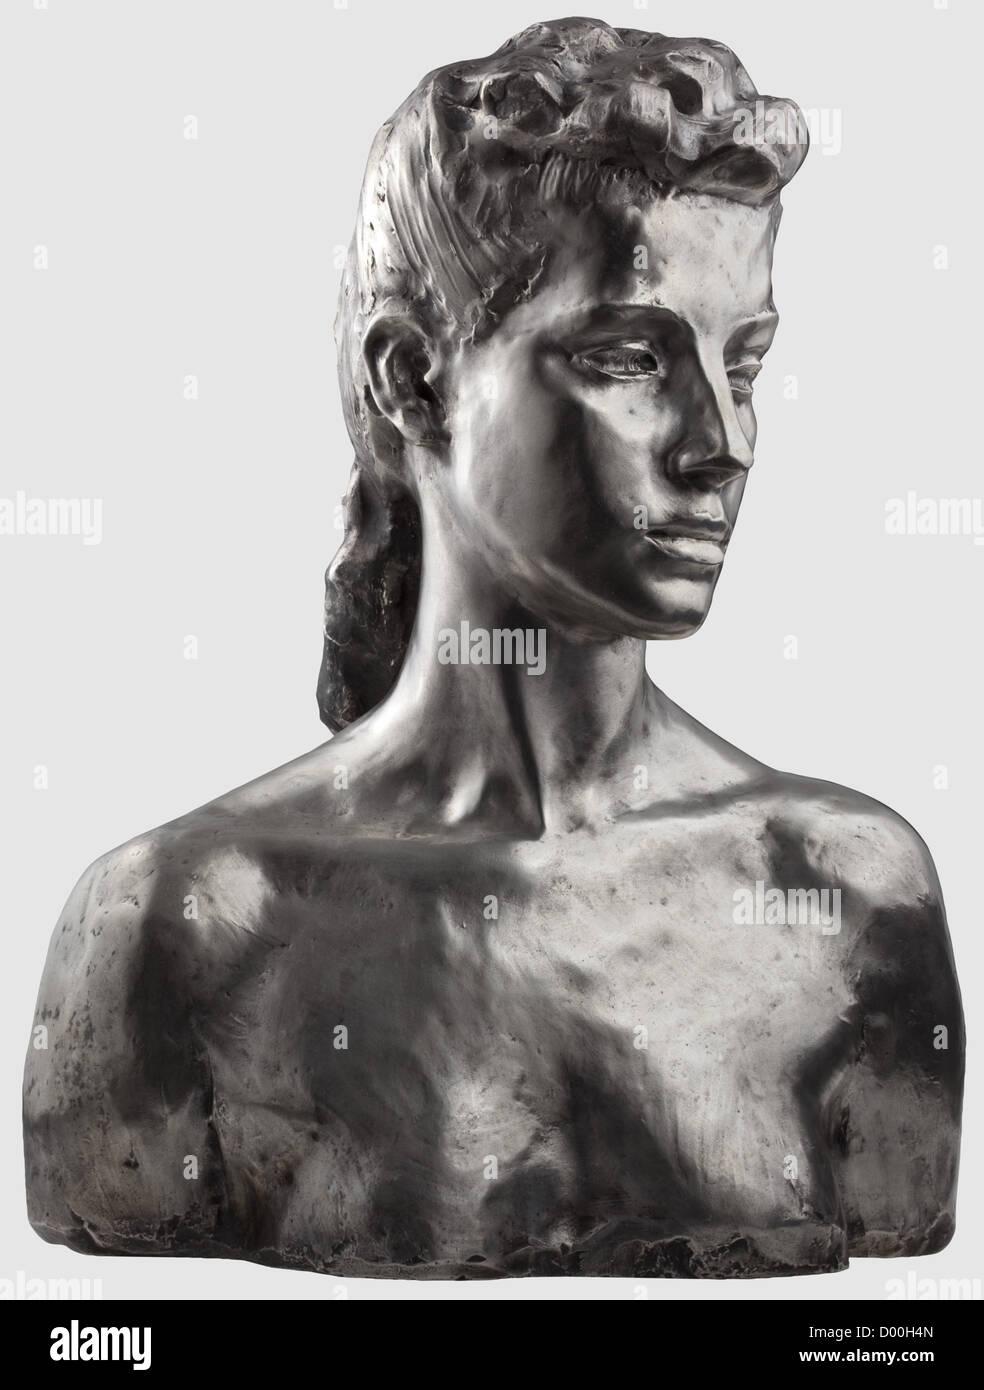 "Una hembra de plata busto - monogrammed 'J', el sello ""Casting Priessmann Bauer & Co München"", Imagen De Stock"